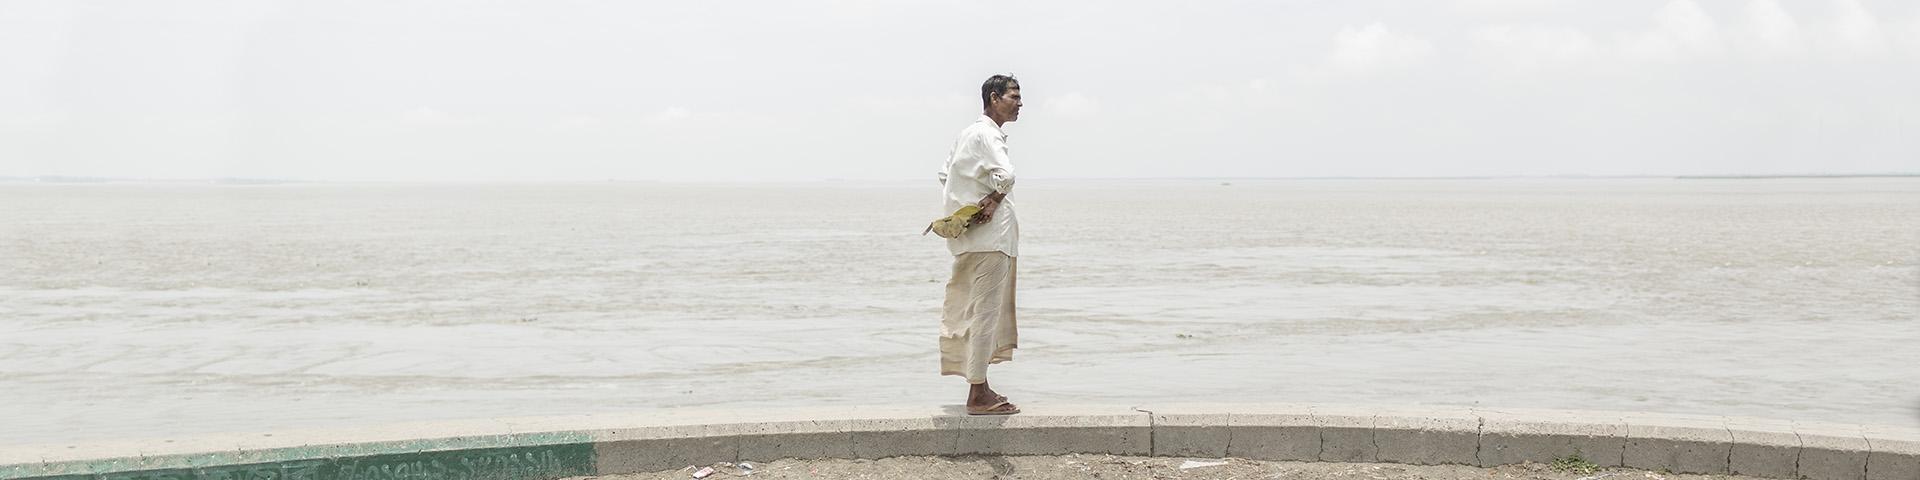 Bangladesh VK 152 ©Mike Roelofs